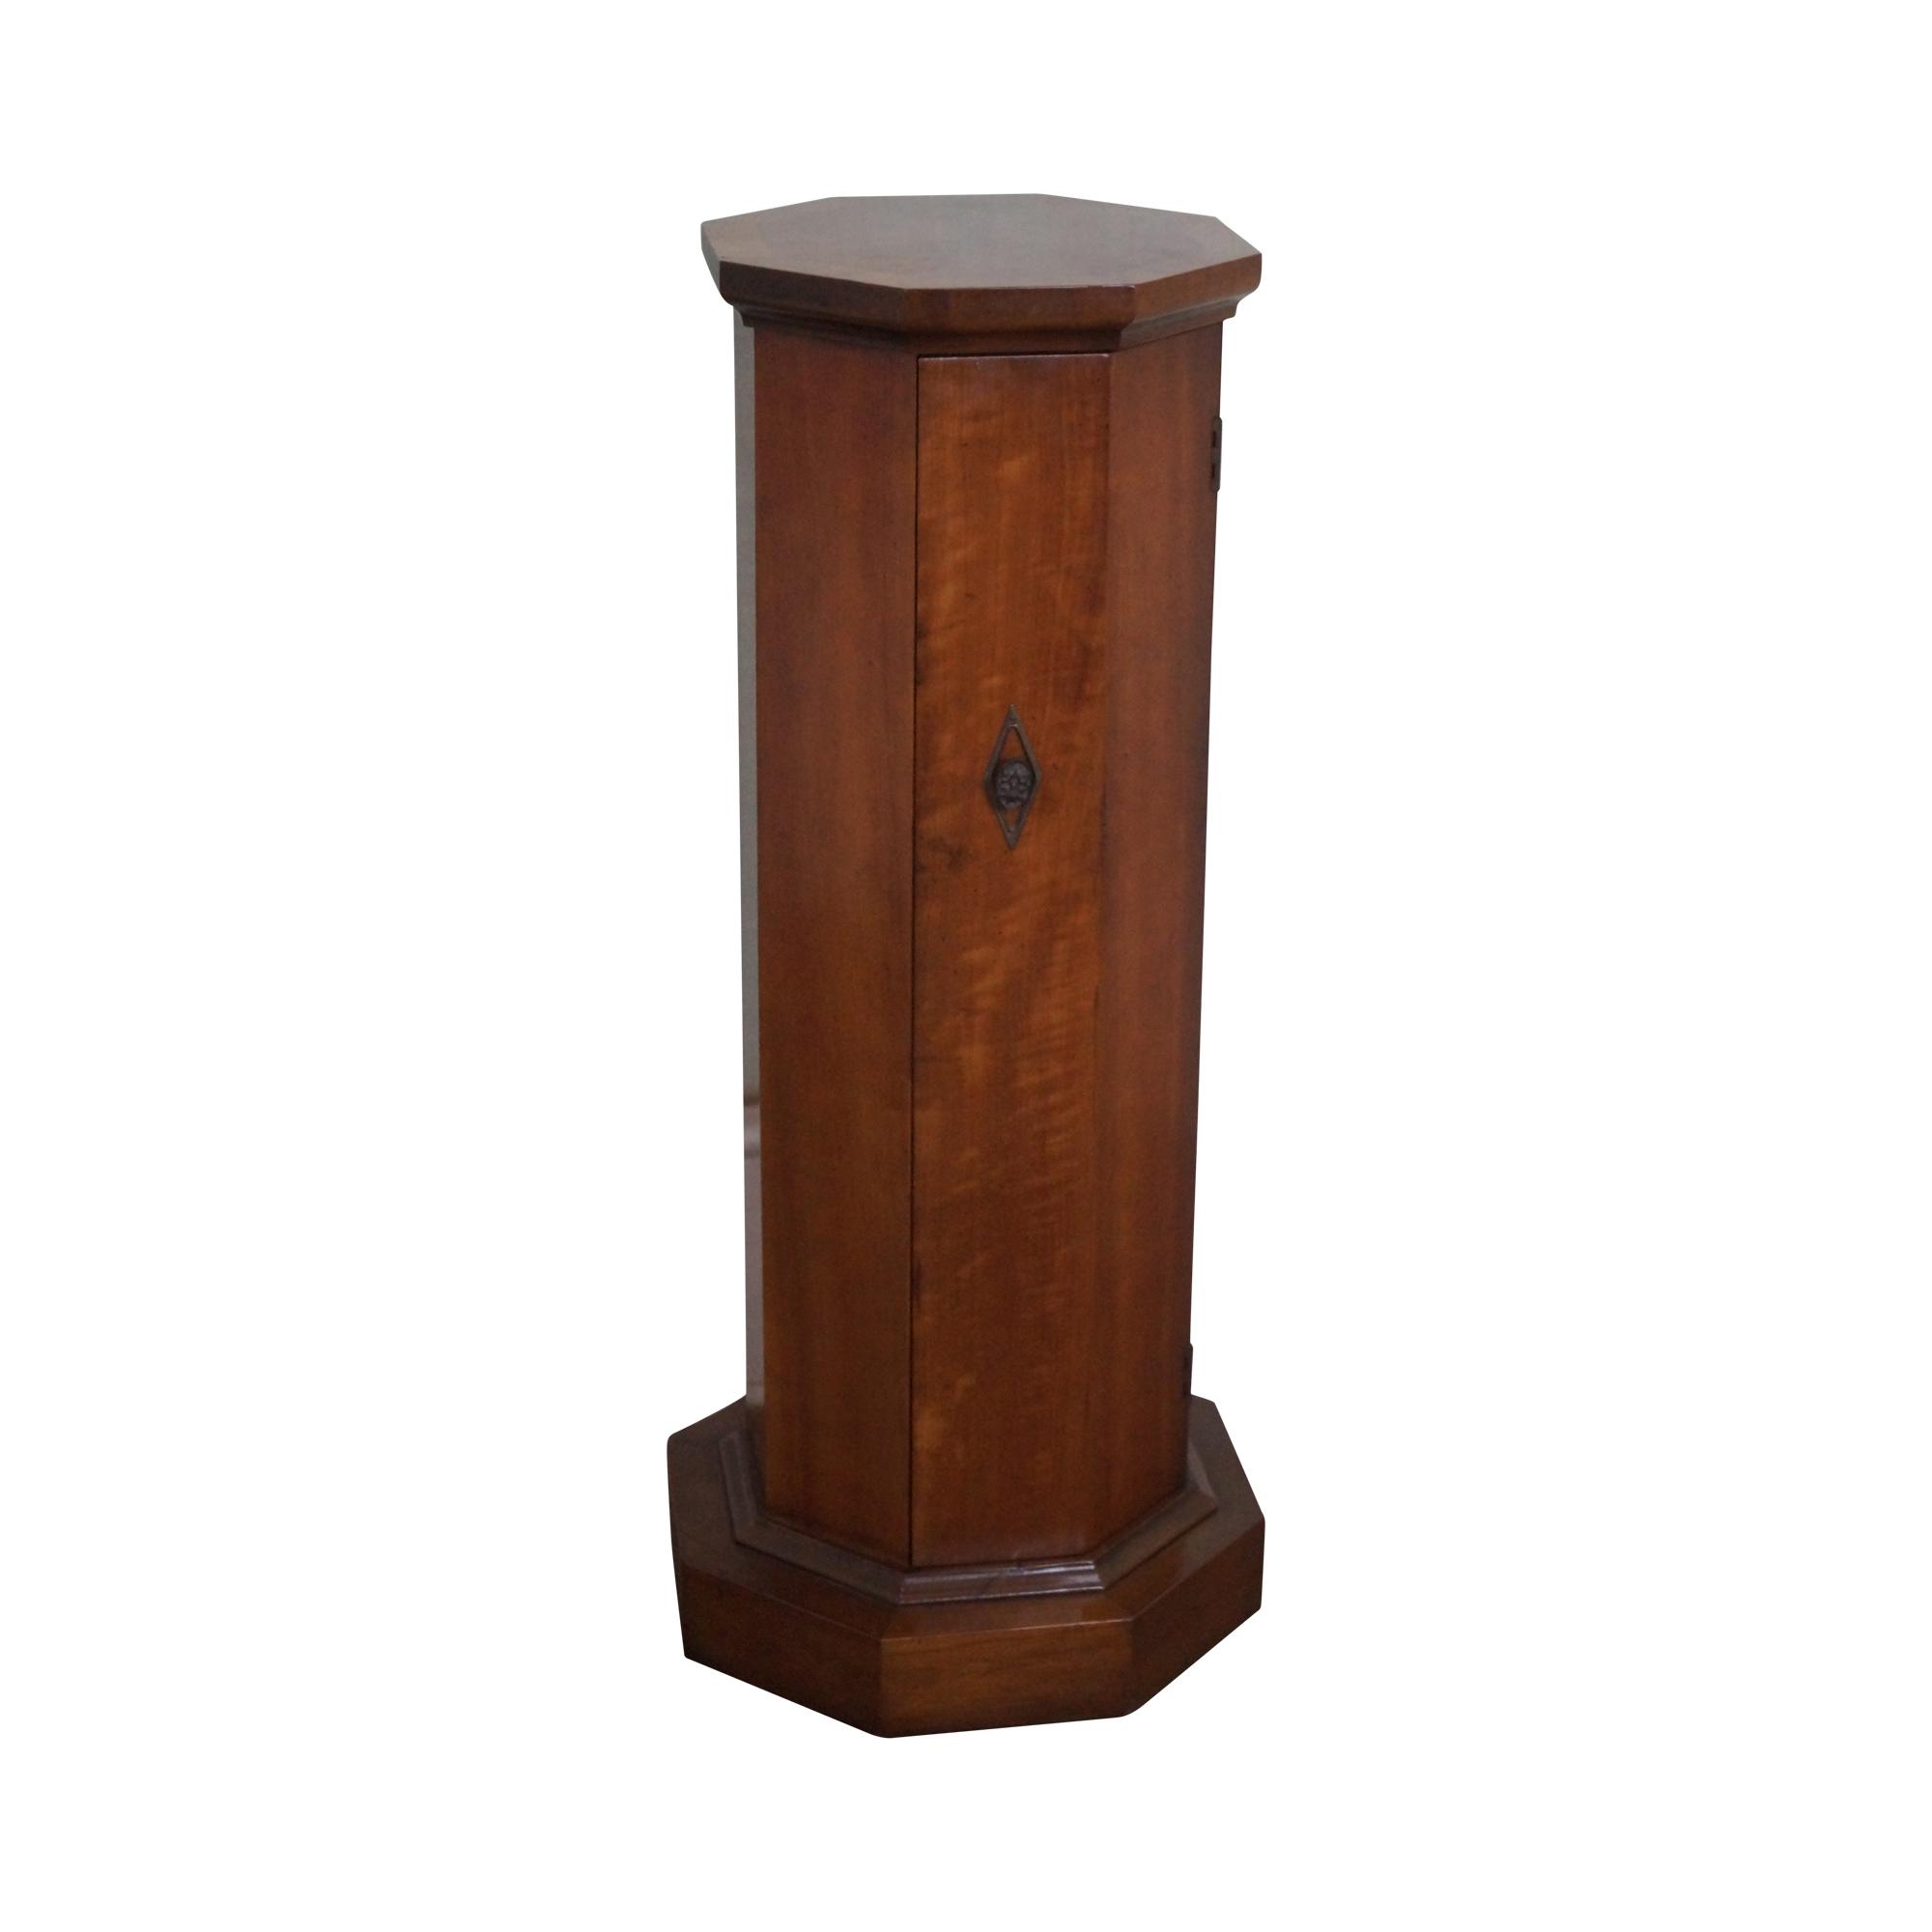 Fine Arts Furniture Co Vintage Regency Pedestal Chairish